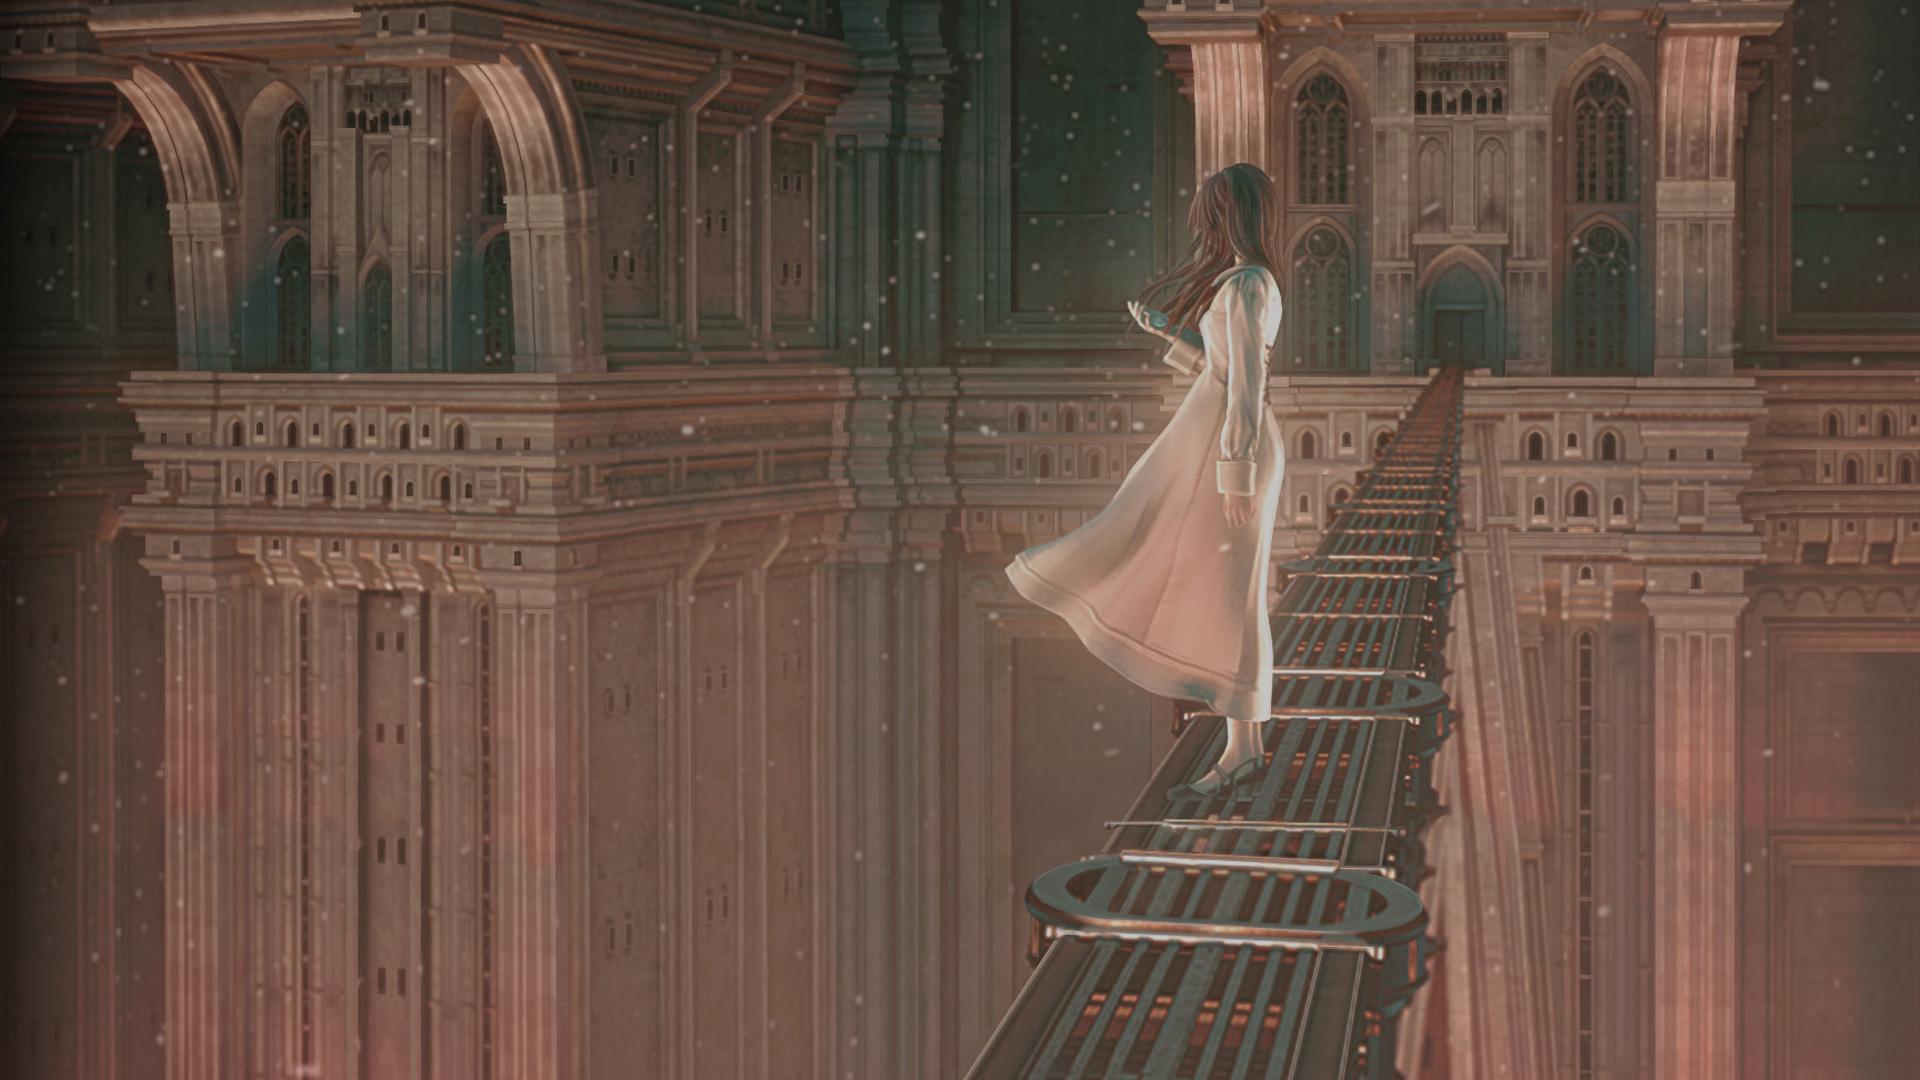 Resonance of Fate Wallpaper in 1920x1080